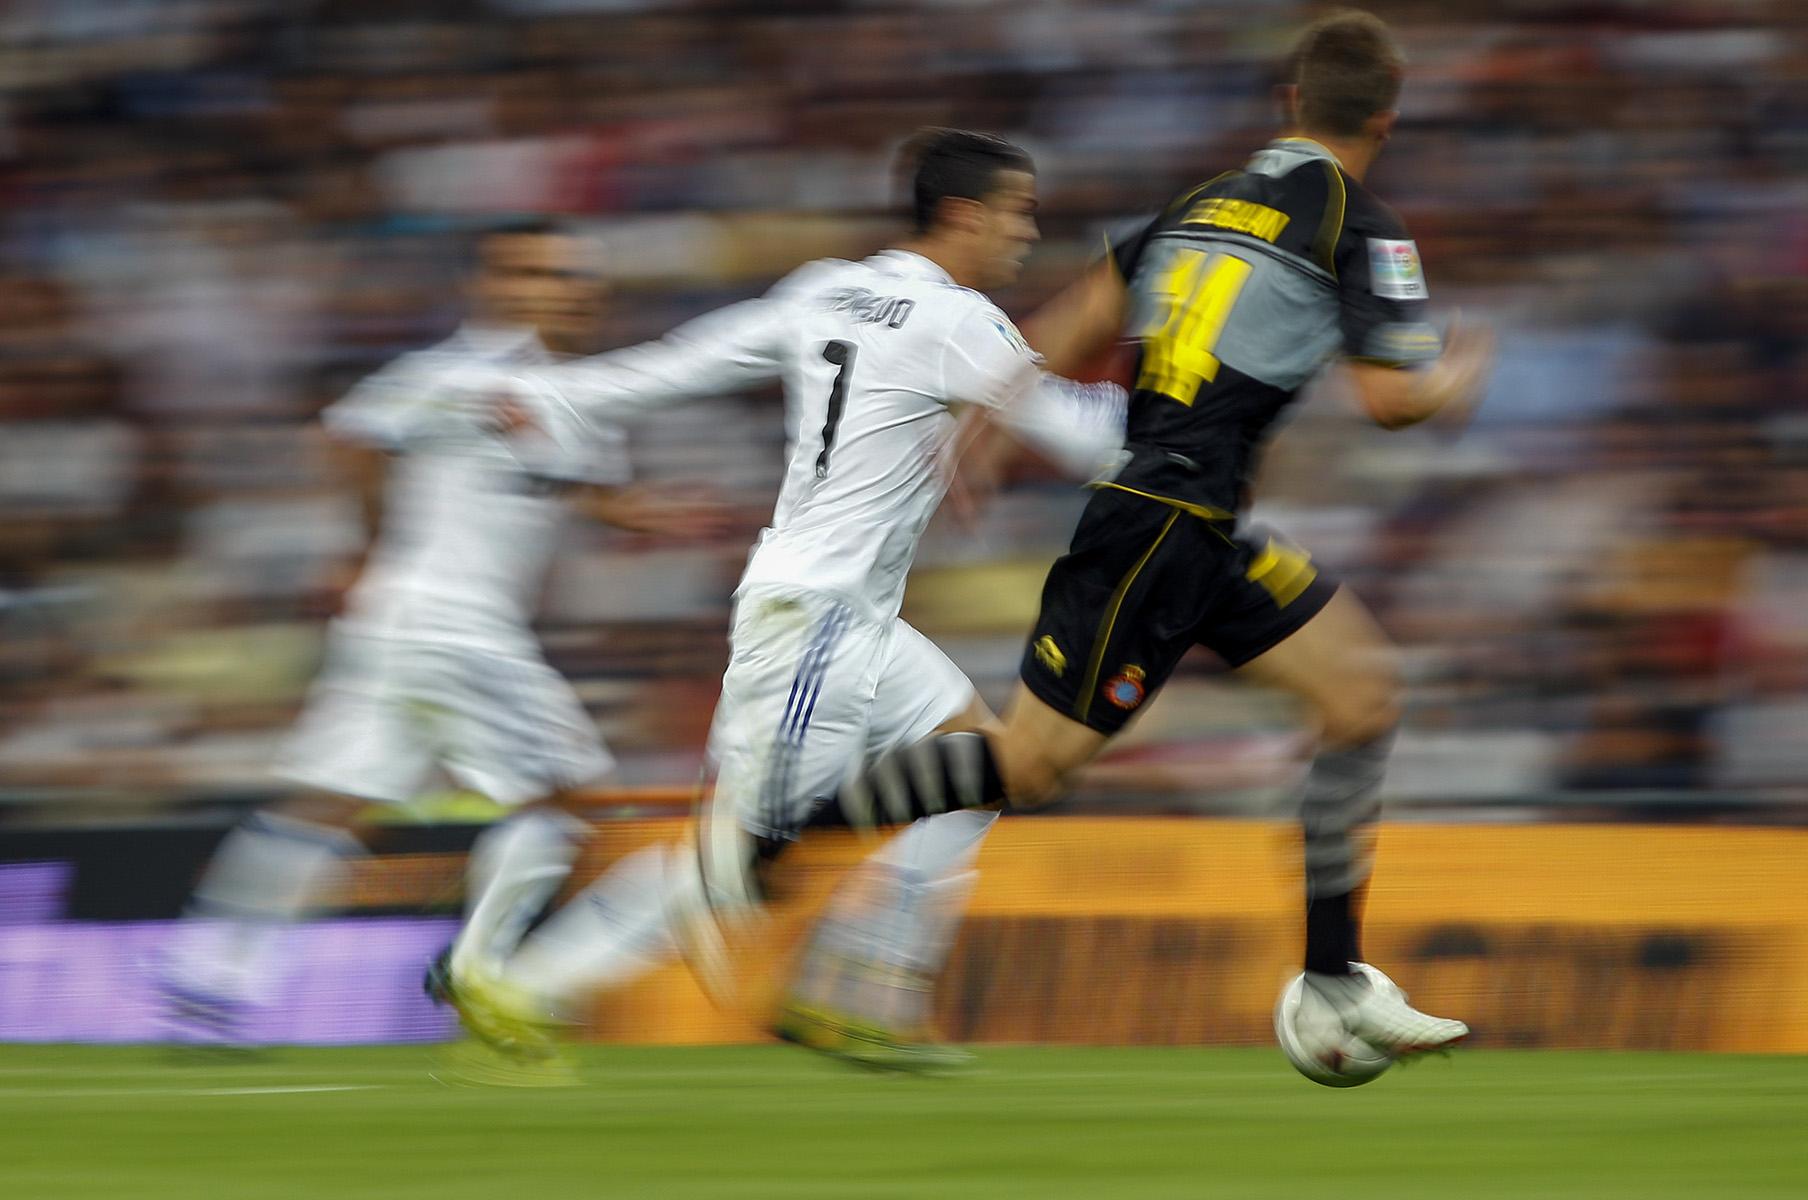 REAL MADRID 3 - RCD ESPANOL 0© ALBERTO R. ROLDAN21 09 2010